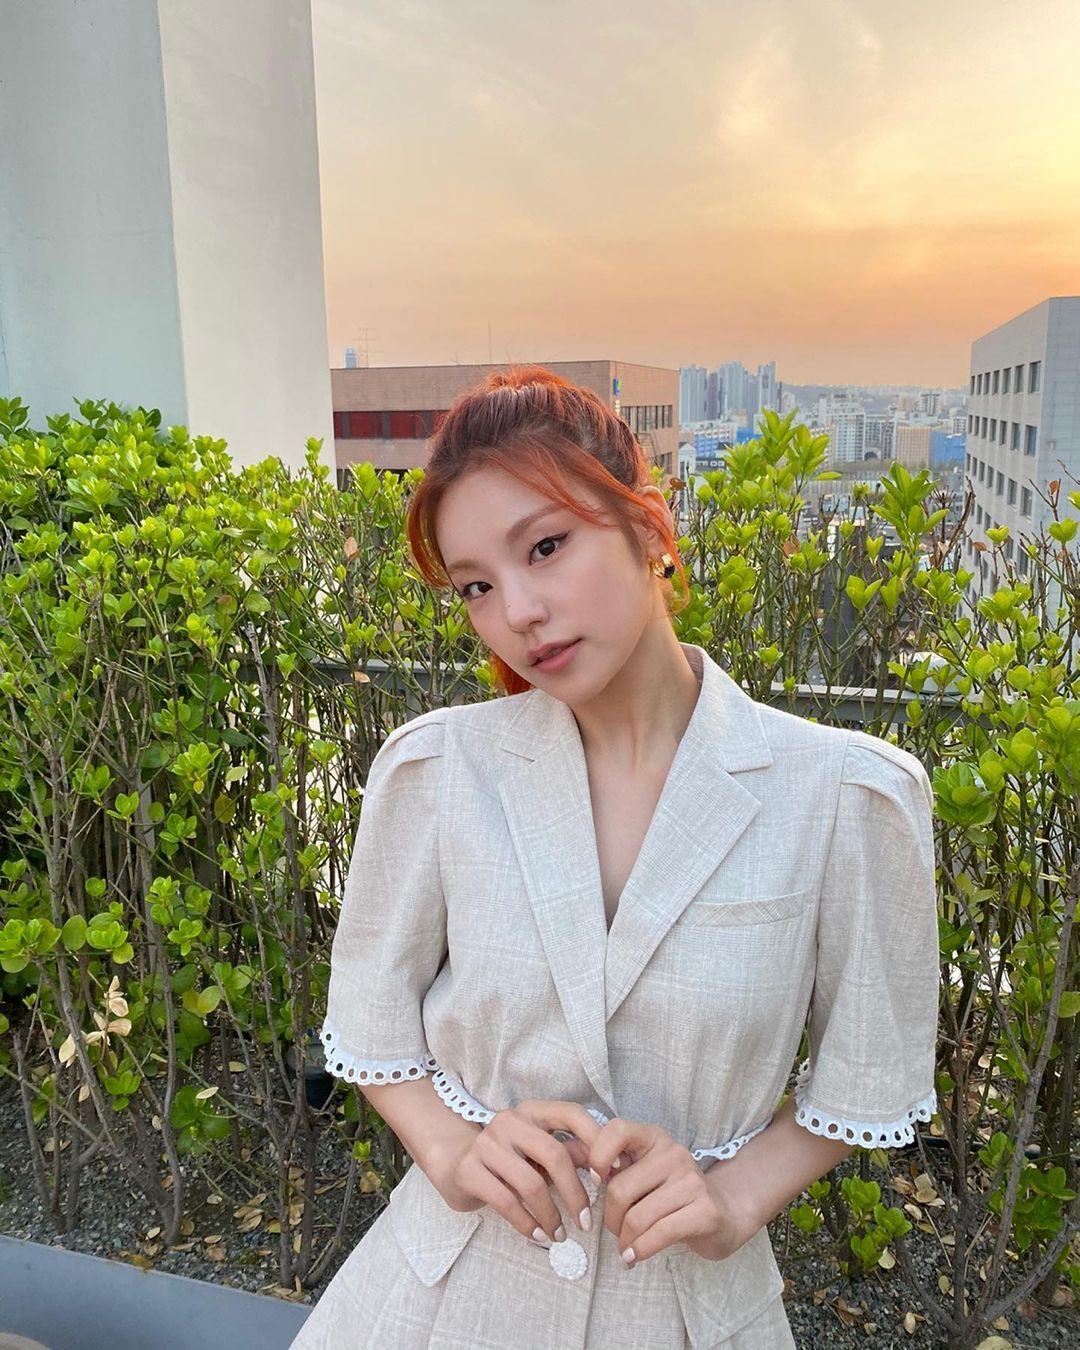 ITZY member Yeji